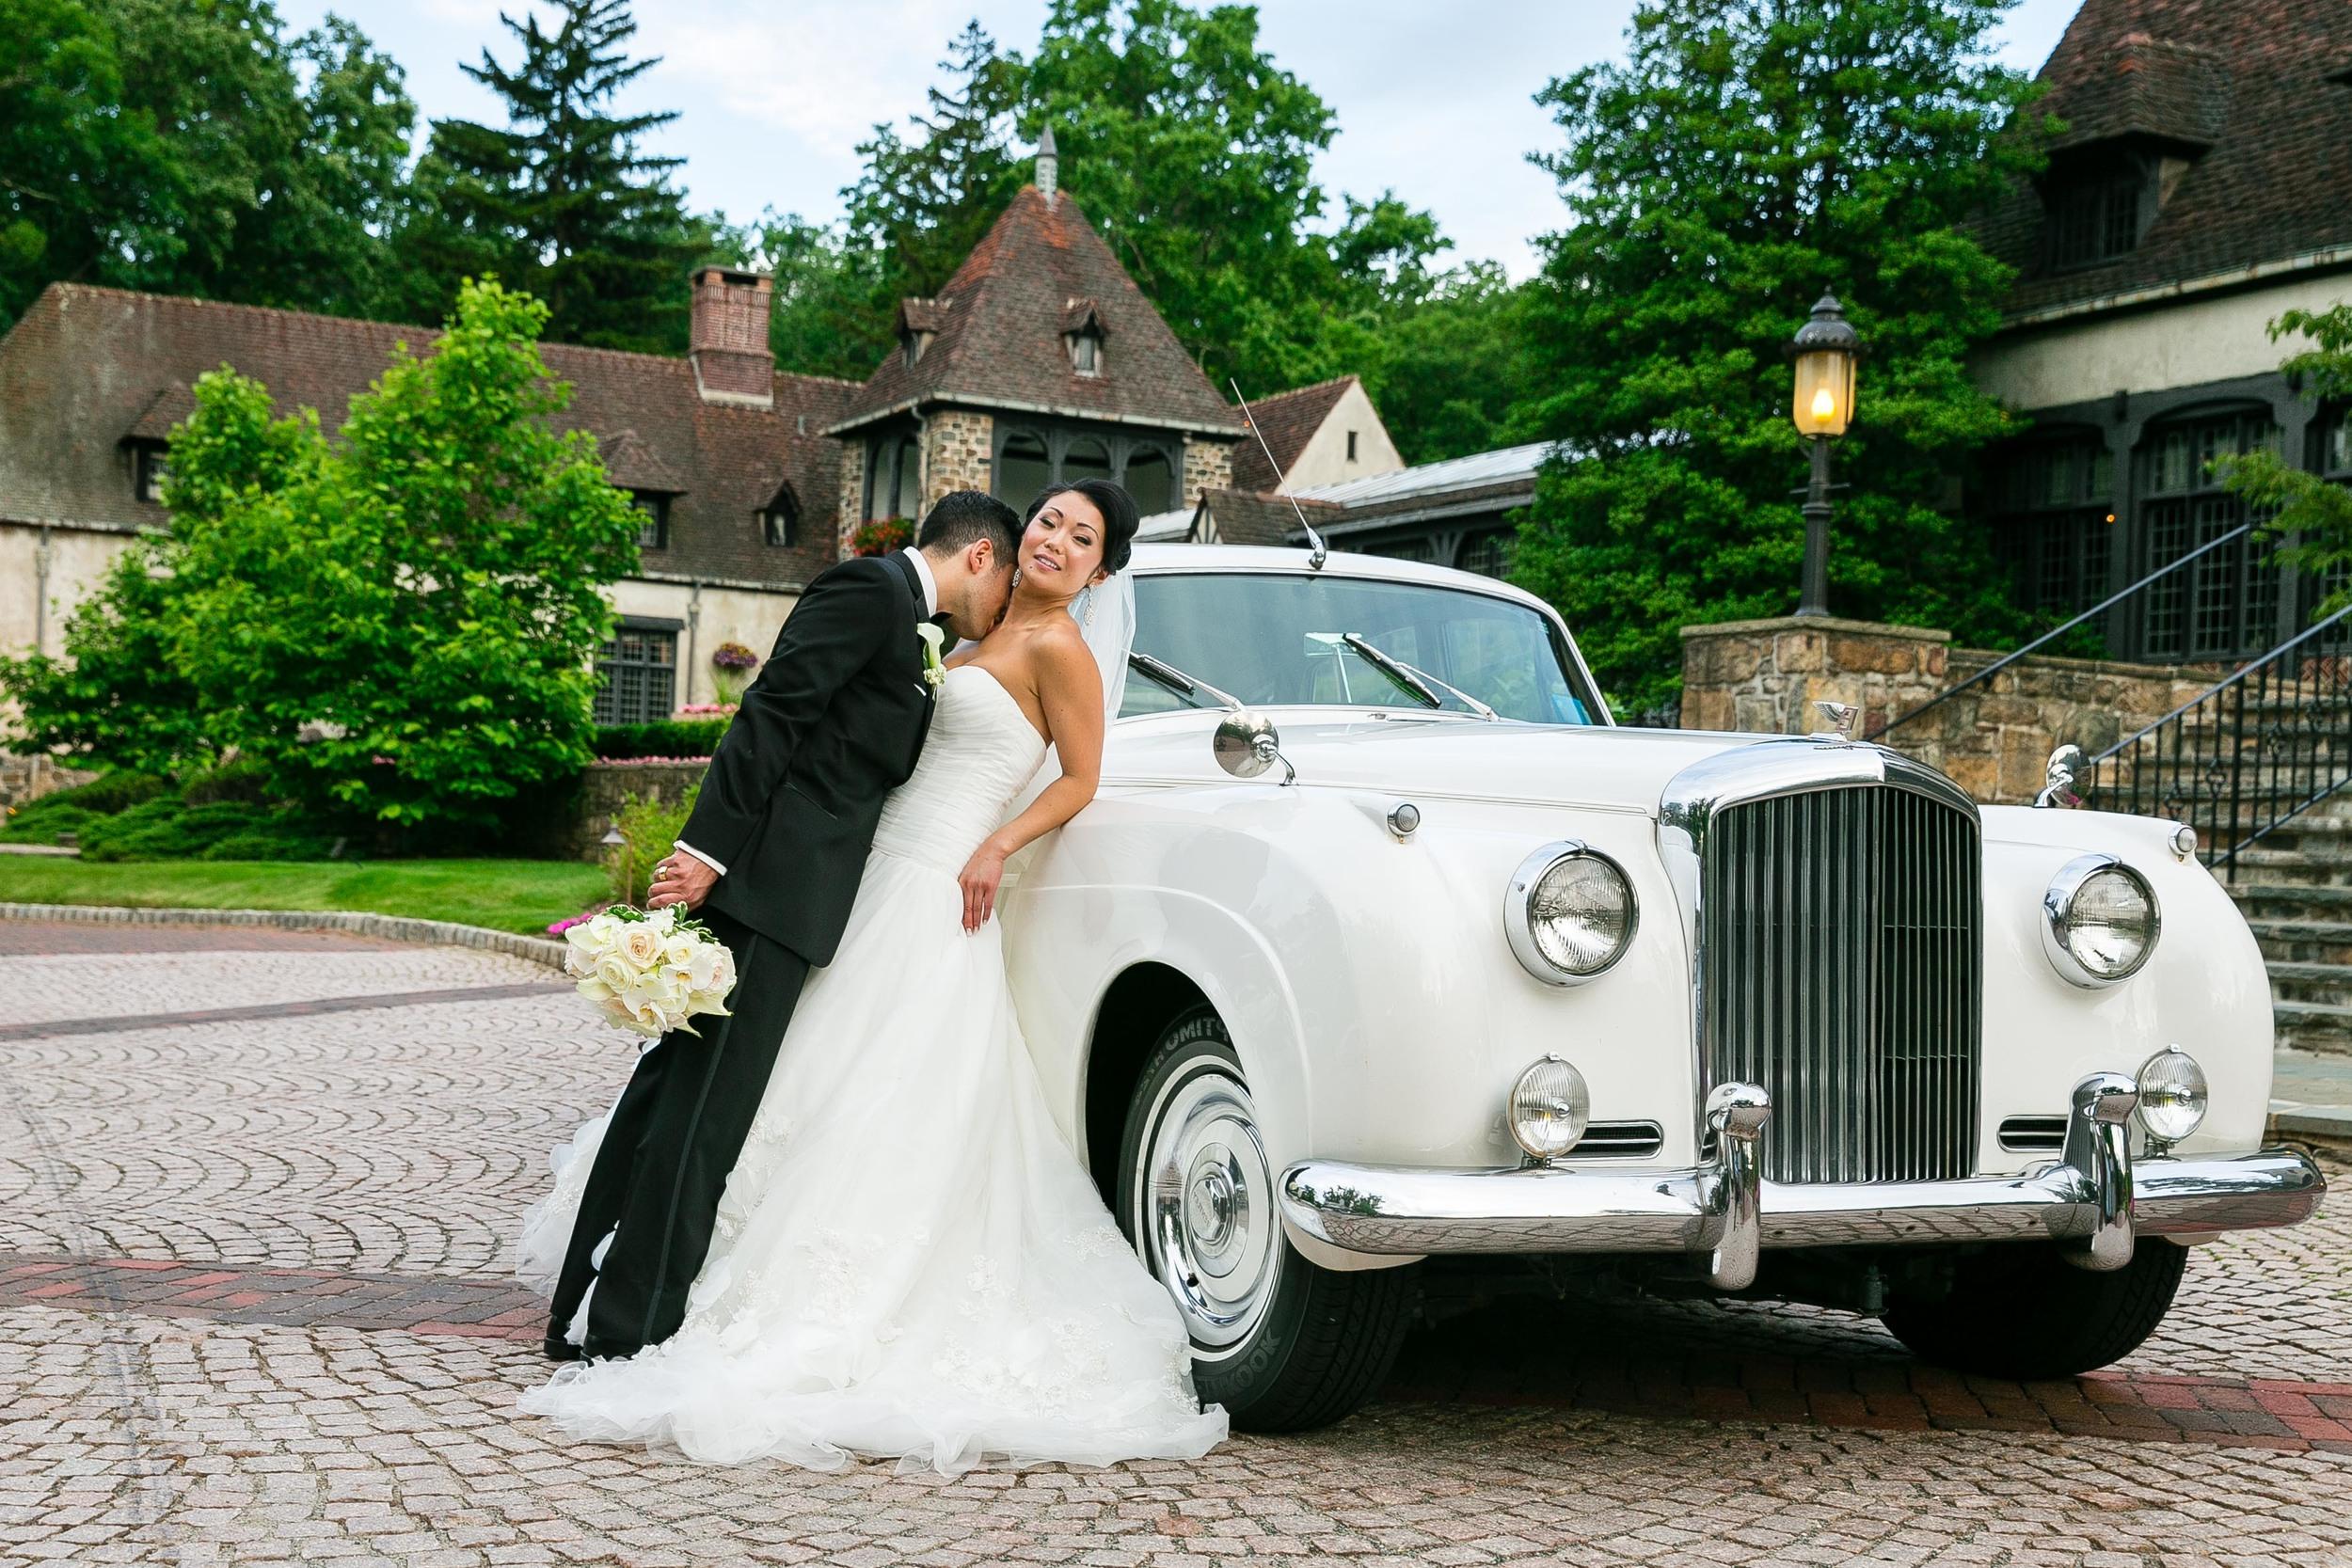 Luxurious-Chinese-Italian-Wedding-Pleasantdale-Chateau-West-Orange-New-Jersey-Photojournalisti-Wedding-Photography-Jacek-Dolata-28.jpg